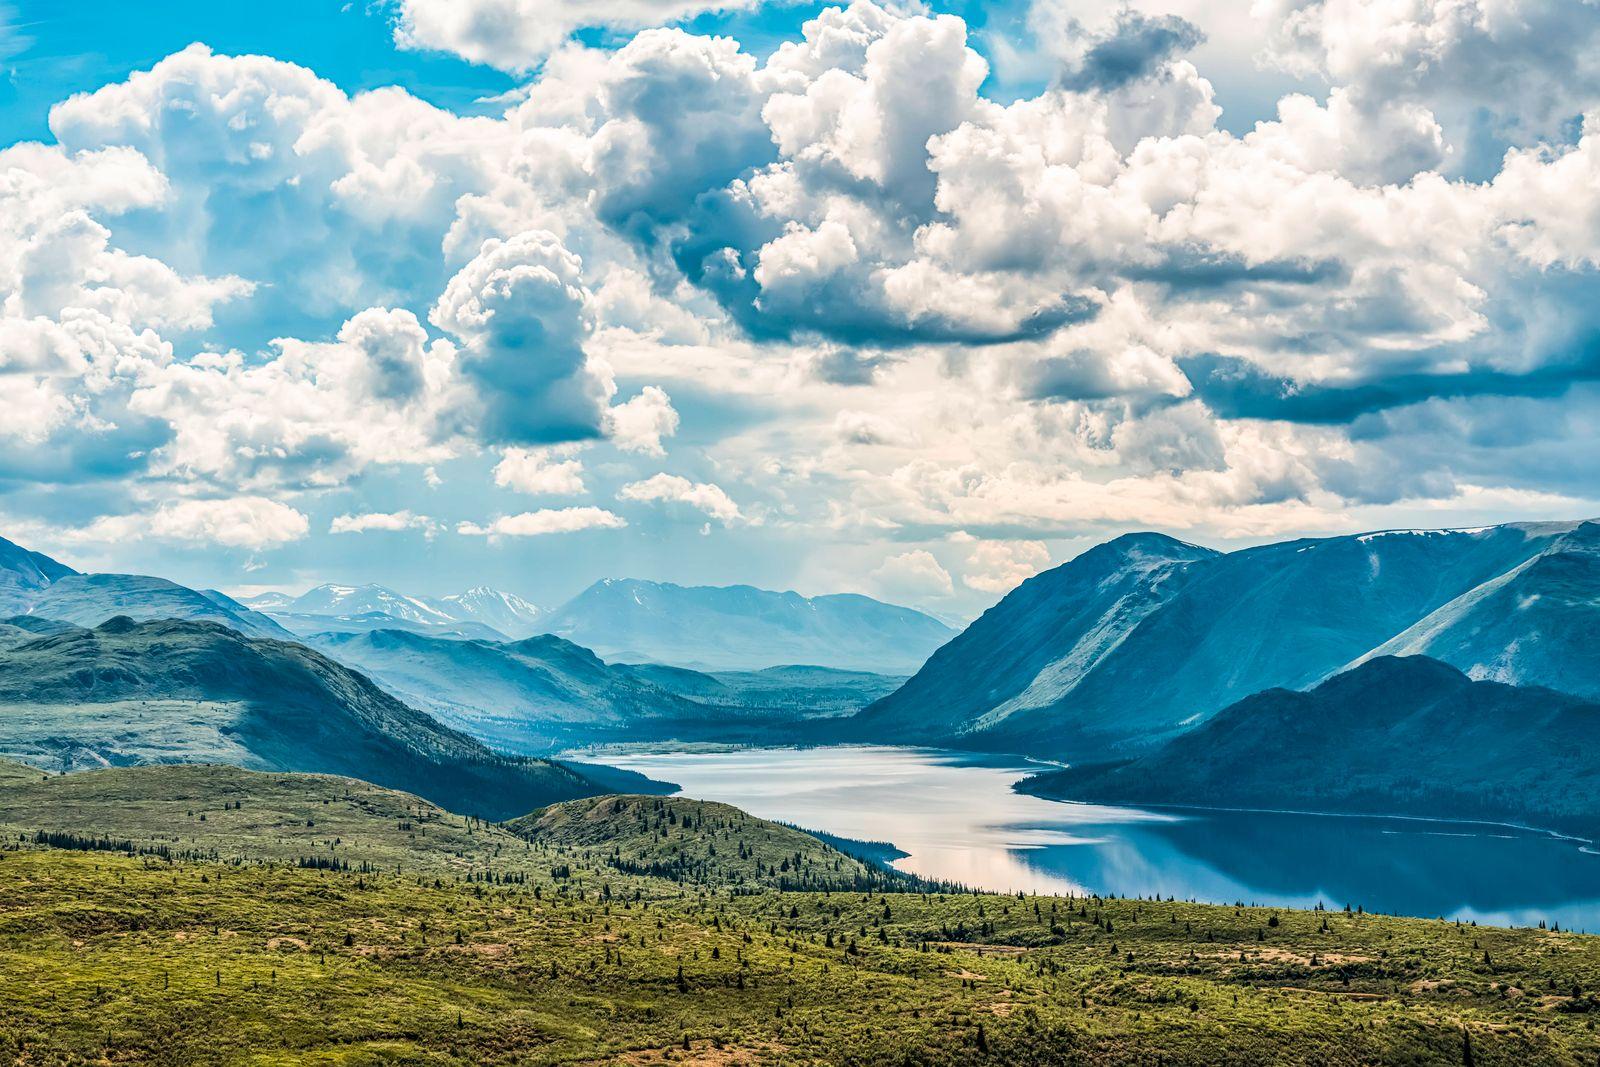 Fish Lake, near Whitehorse; Yukon, Canada PUBLICATIONxINxGERxSUIxAUTxONLY Copyright: RobertxPostma 13077788